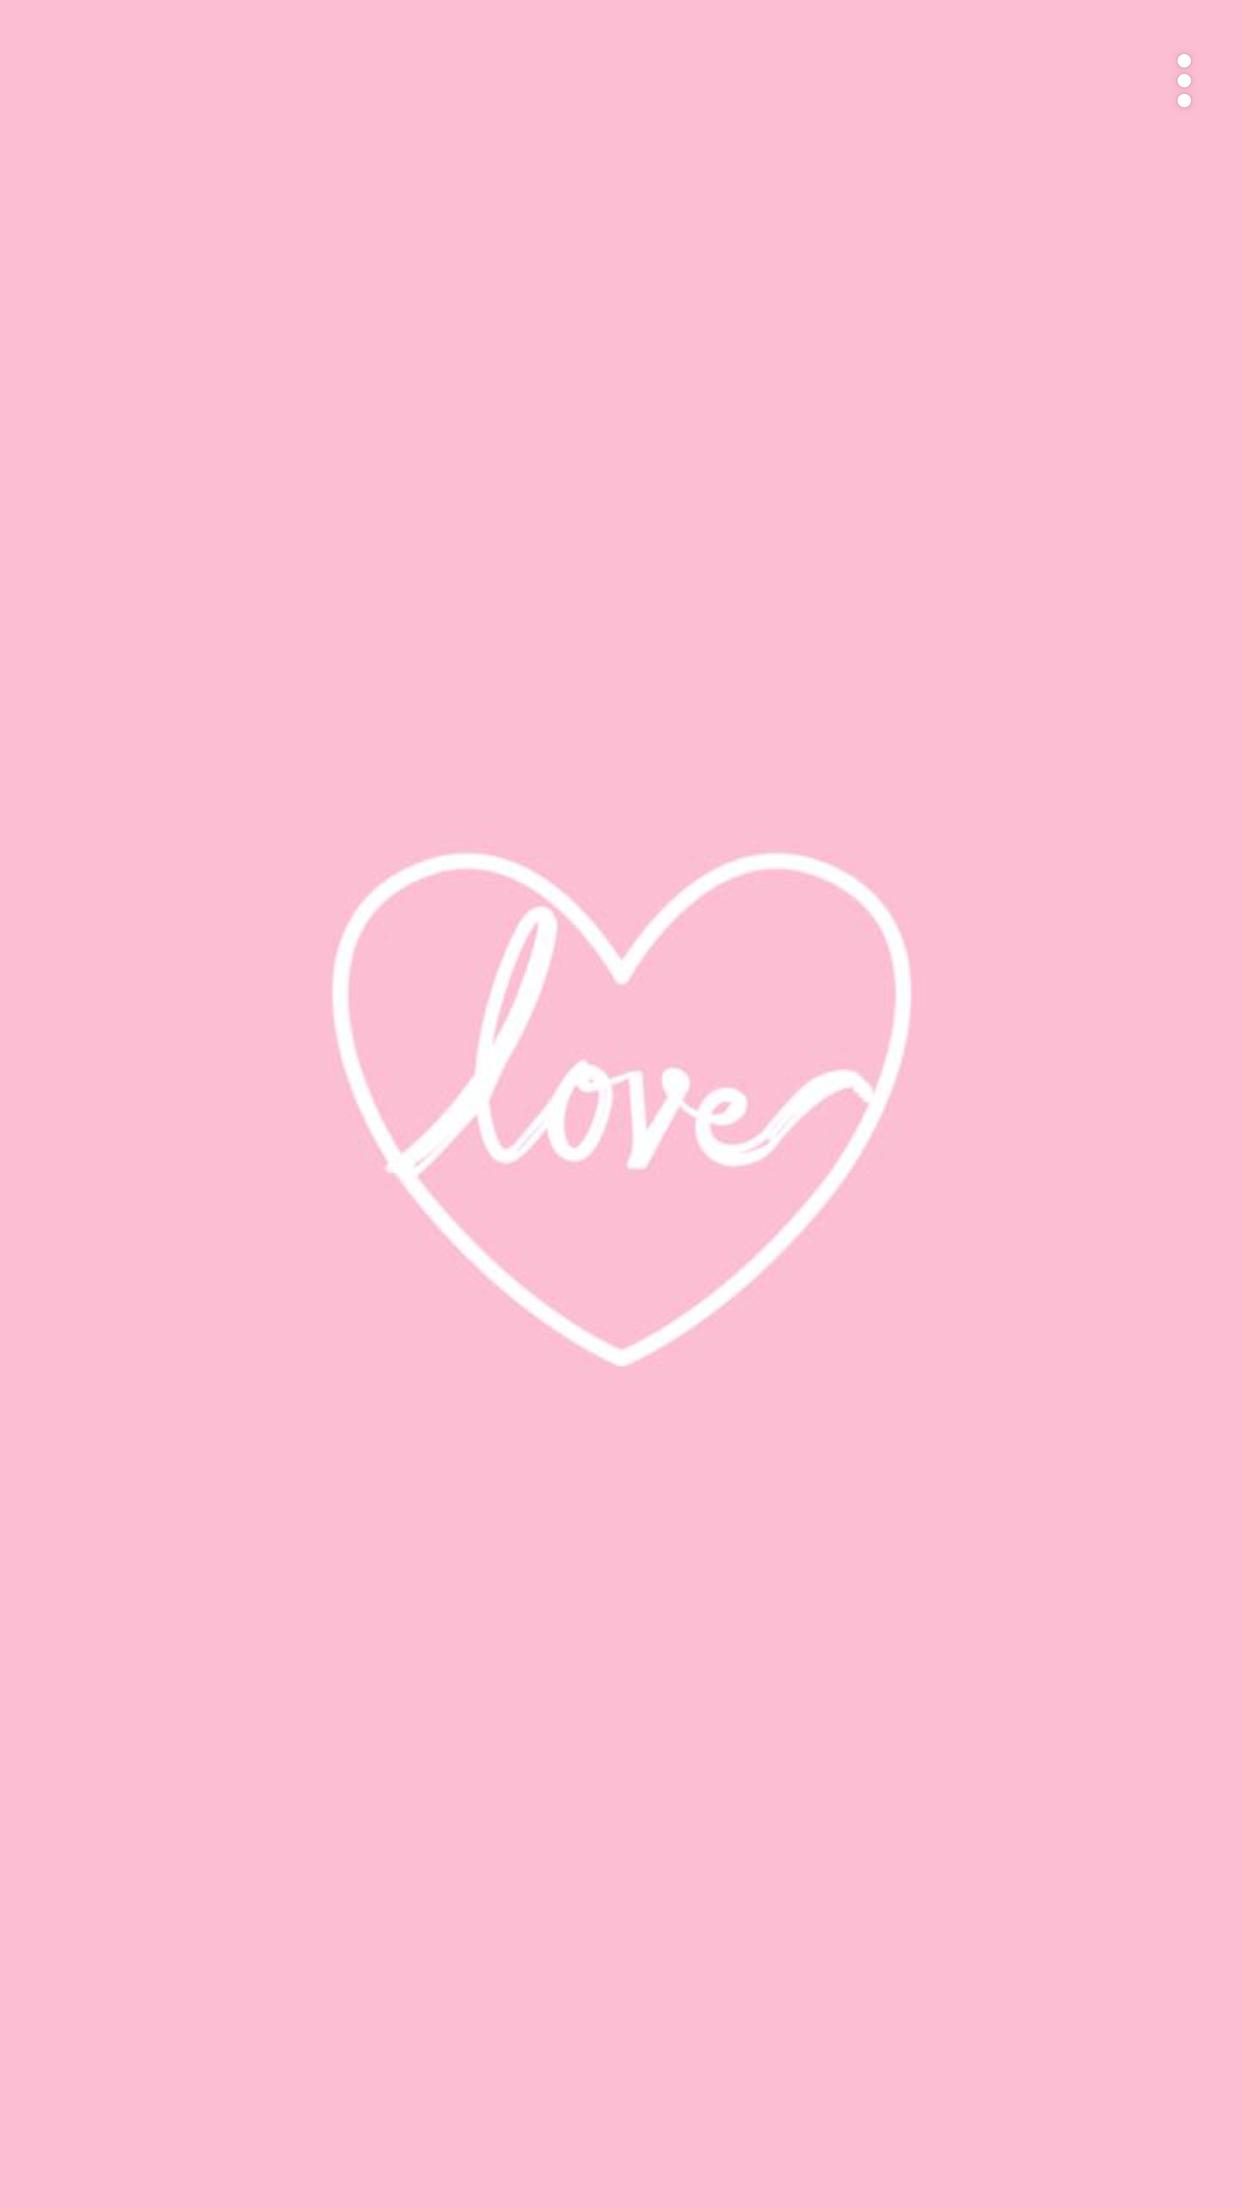 Fond D Ecran Coeur Love Rose Blanc Fond D Ecran Pastel Fond D Ecran Telephone Fond Ecran